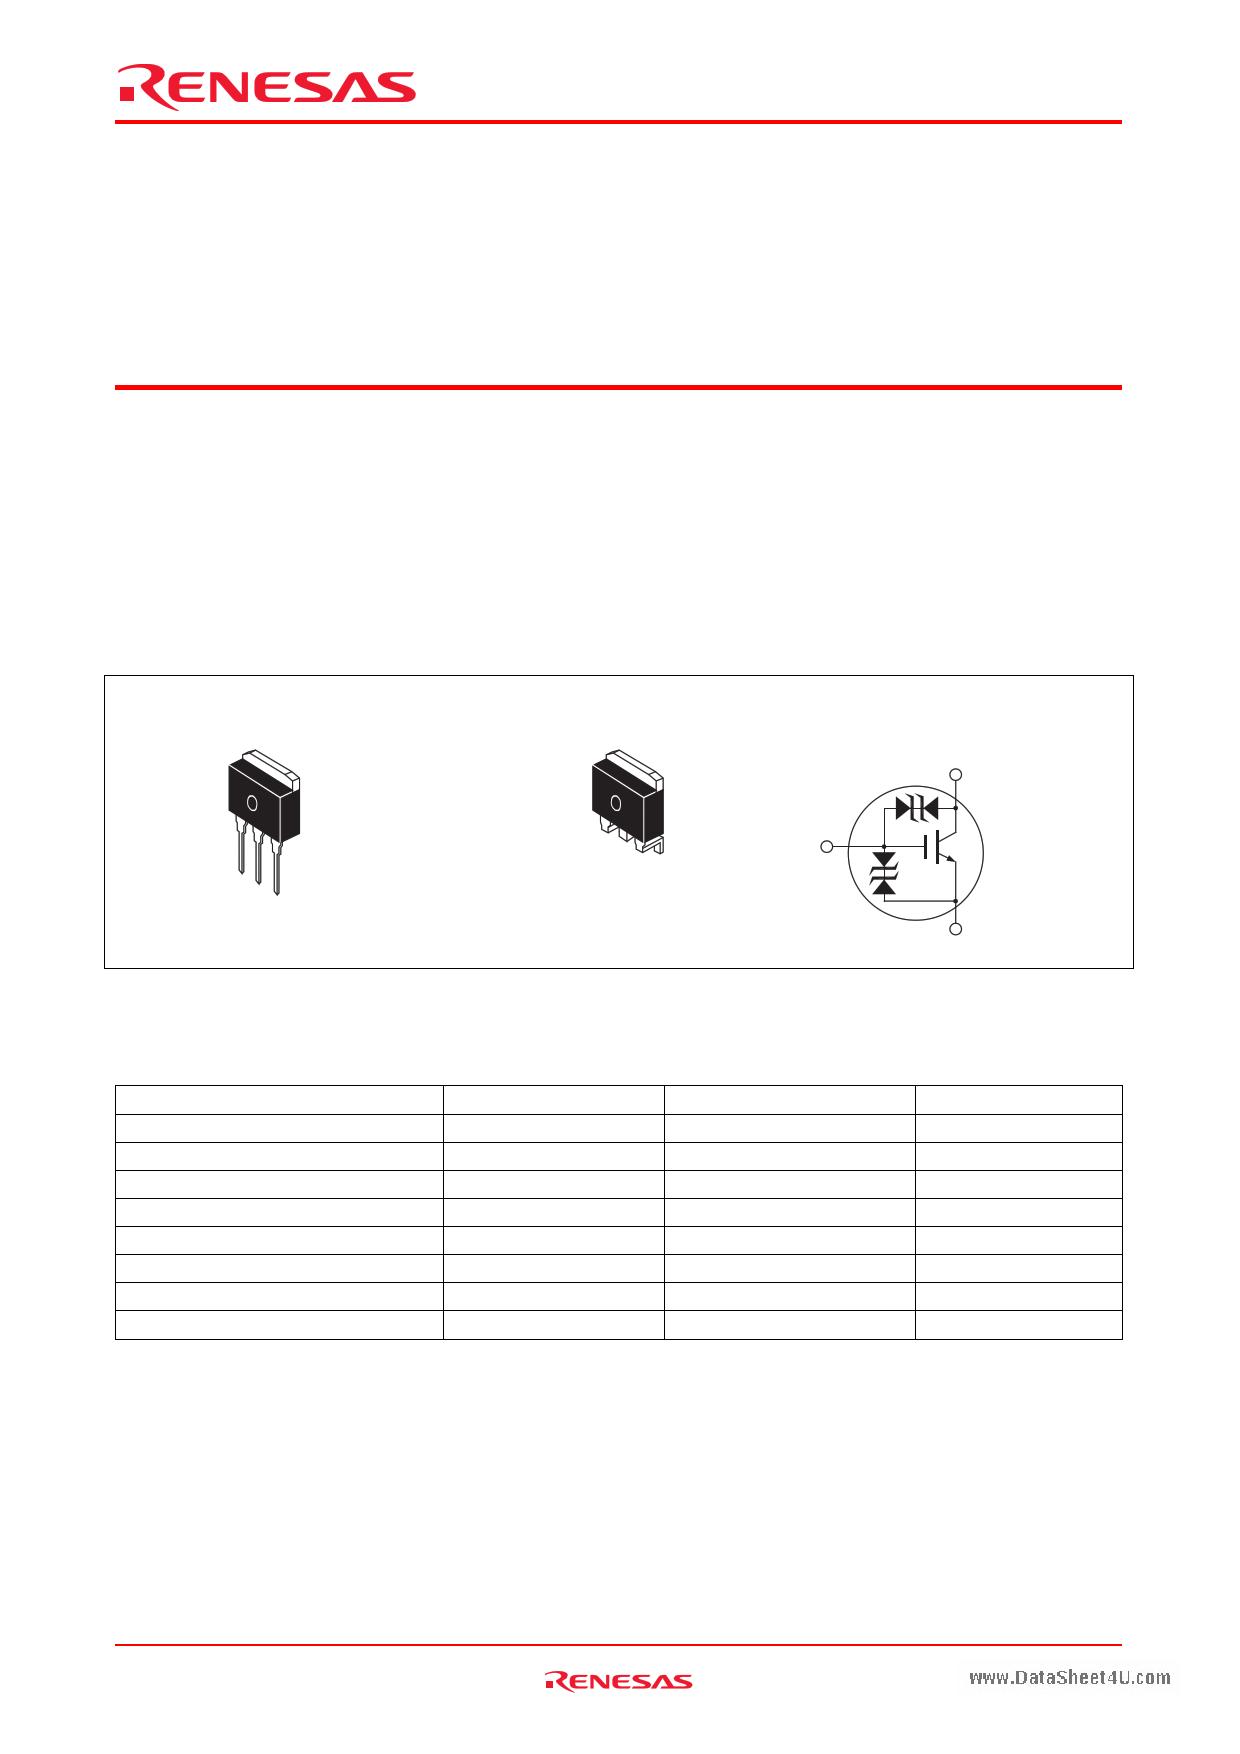 Ld7301 datasheet pdf - lighting device technologies